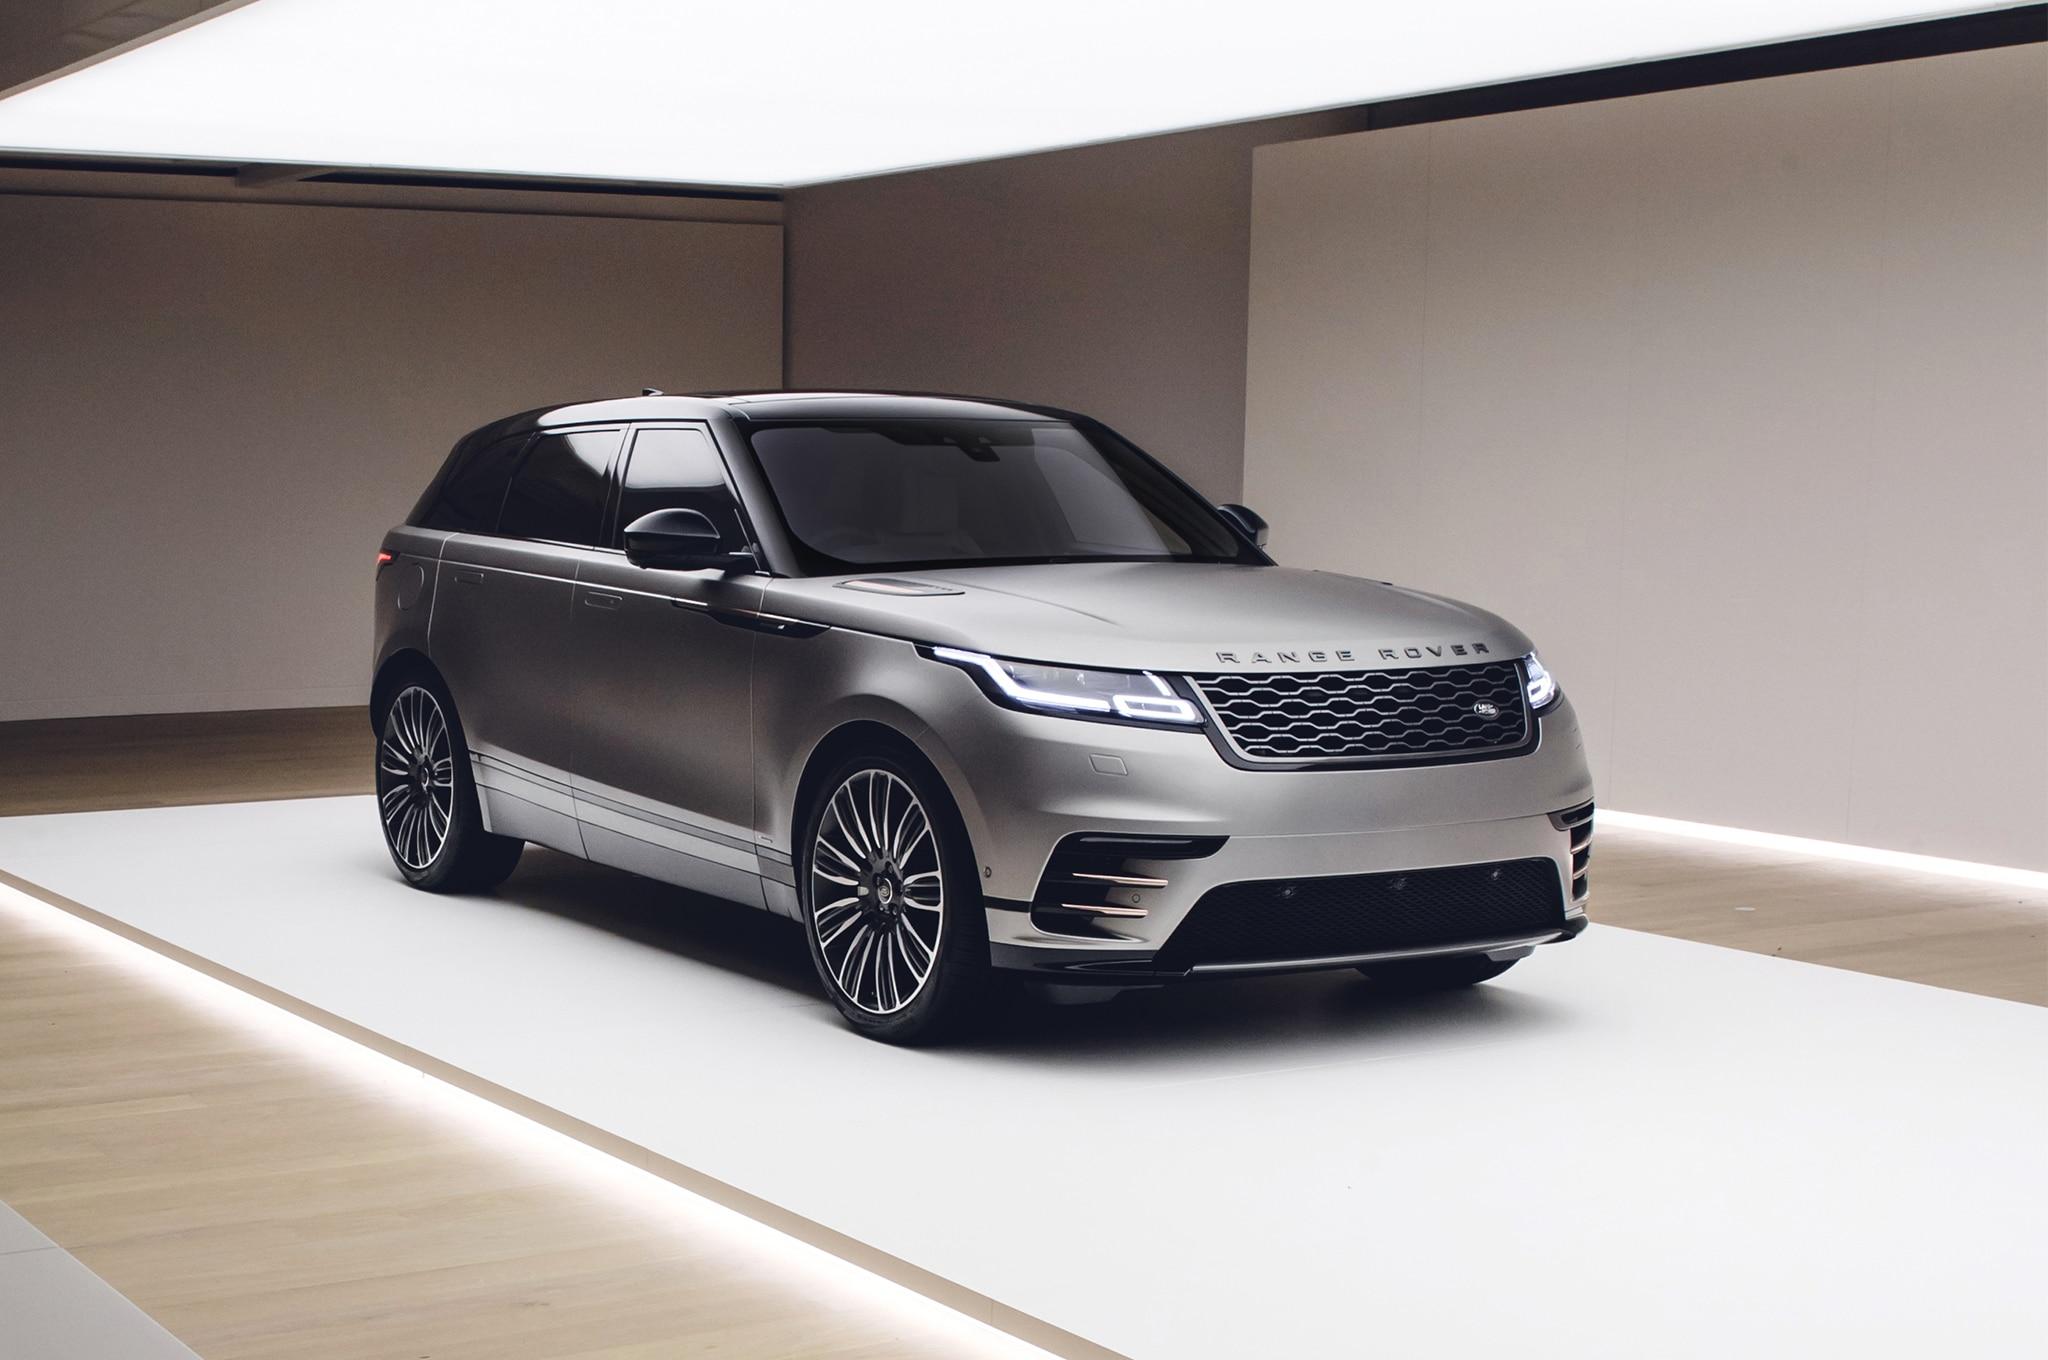 Reno Land Rover >> 2018-Land-Rover-Range-Rover-Velar-front-three-quarters-1 - Motor Trend en Español